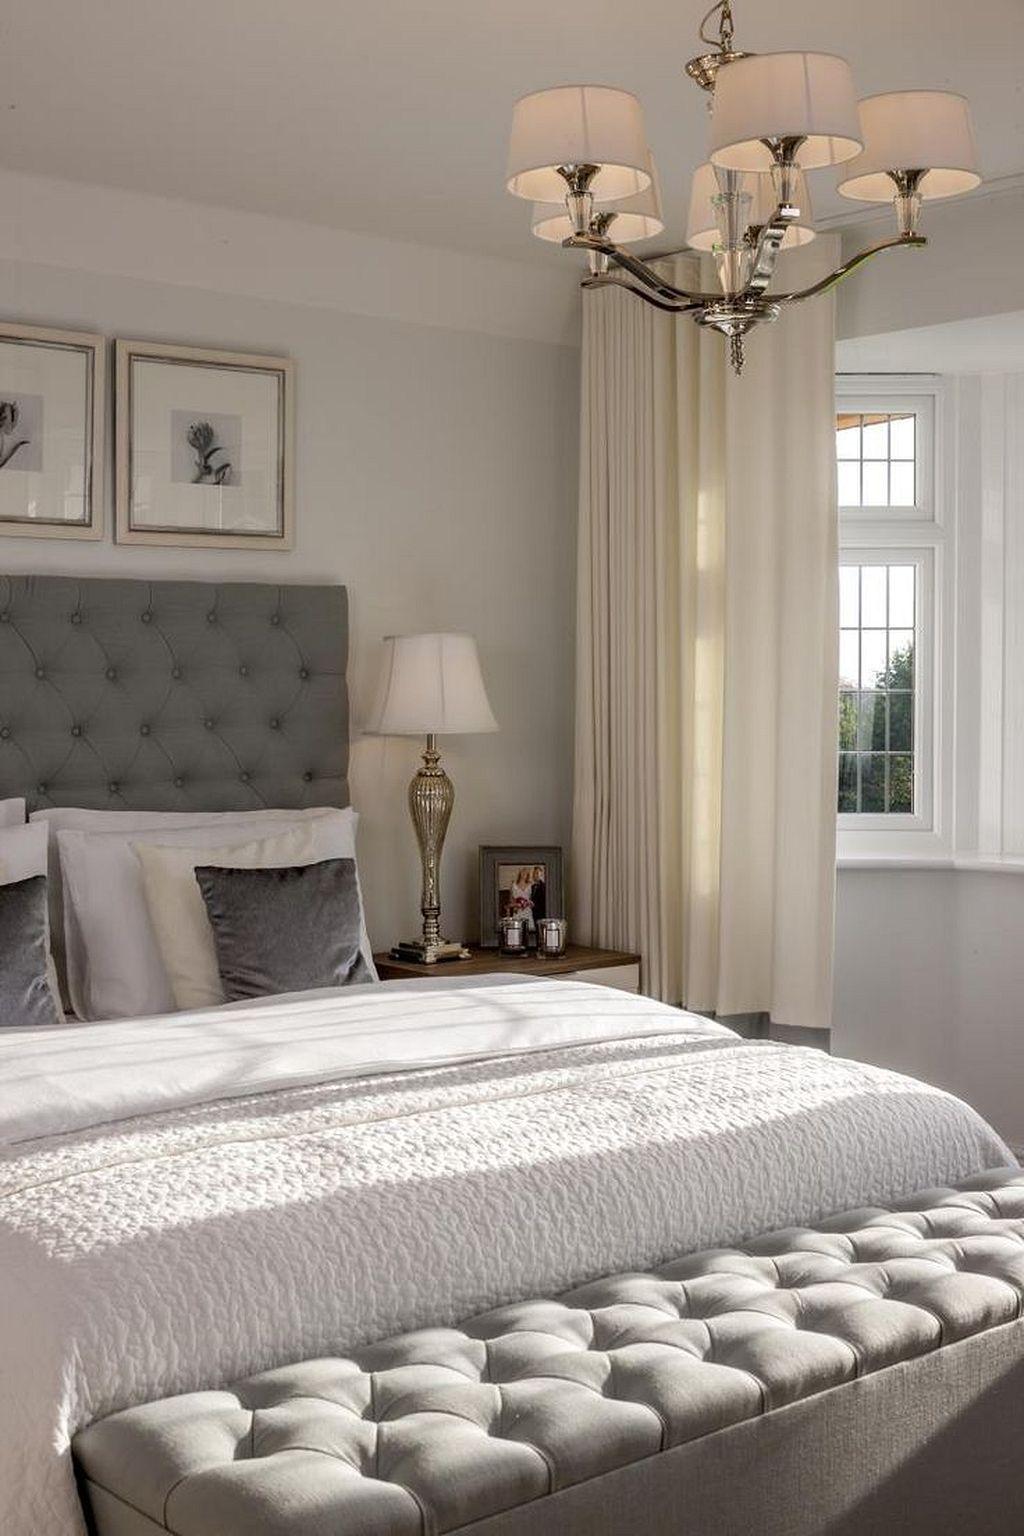 Nice 34 Elegant Bedroom Decoration Ideas Https Kidmagz Com 34 Elegant Bedroom Decoration Ideas Elegant Bedroom Bedroom Interior Simple Bedroom Design